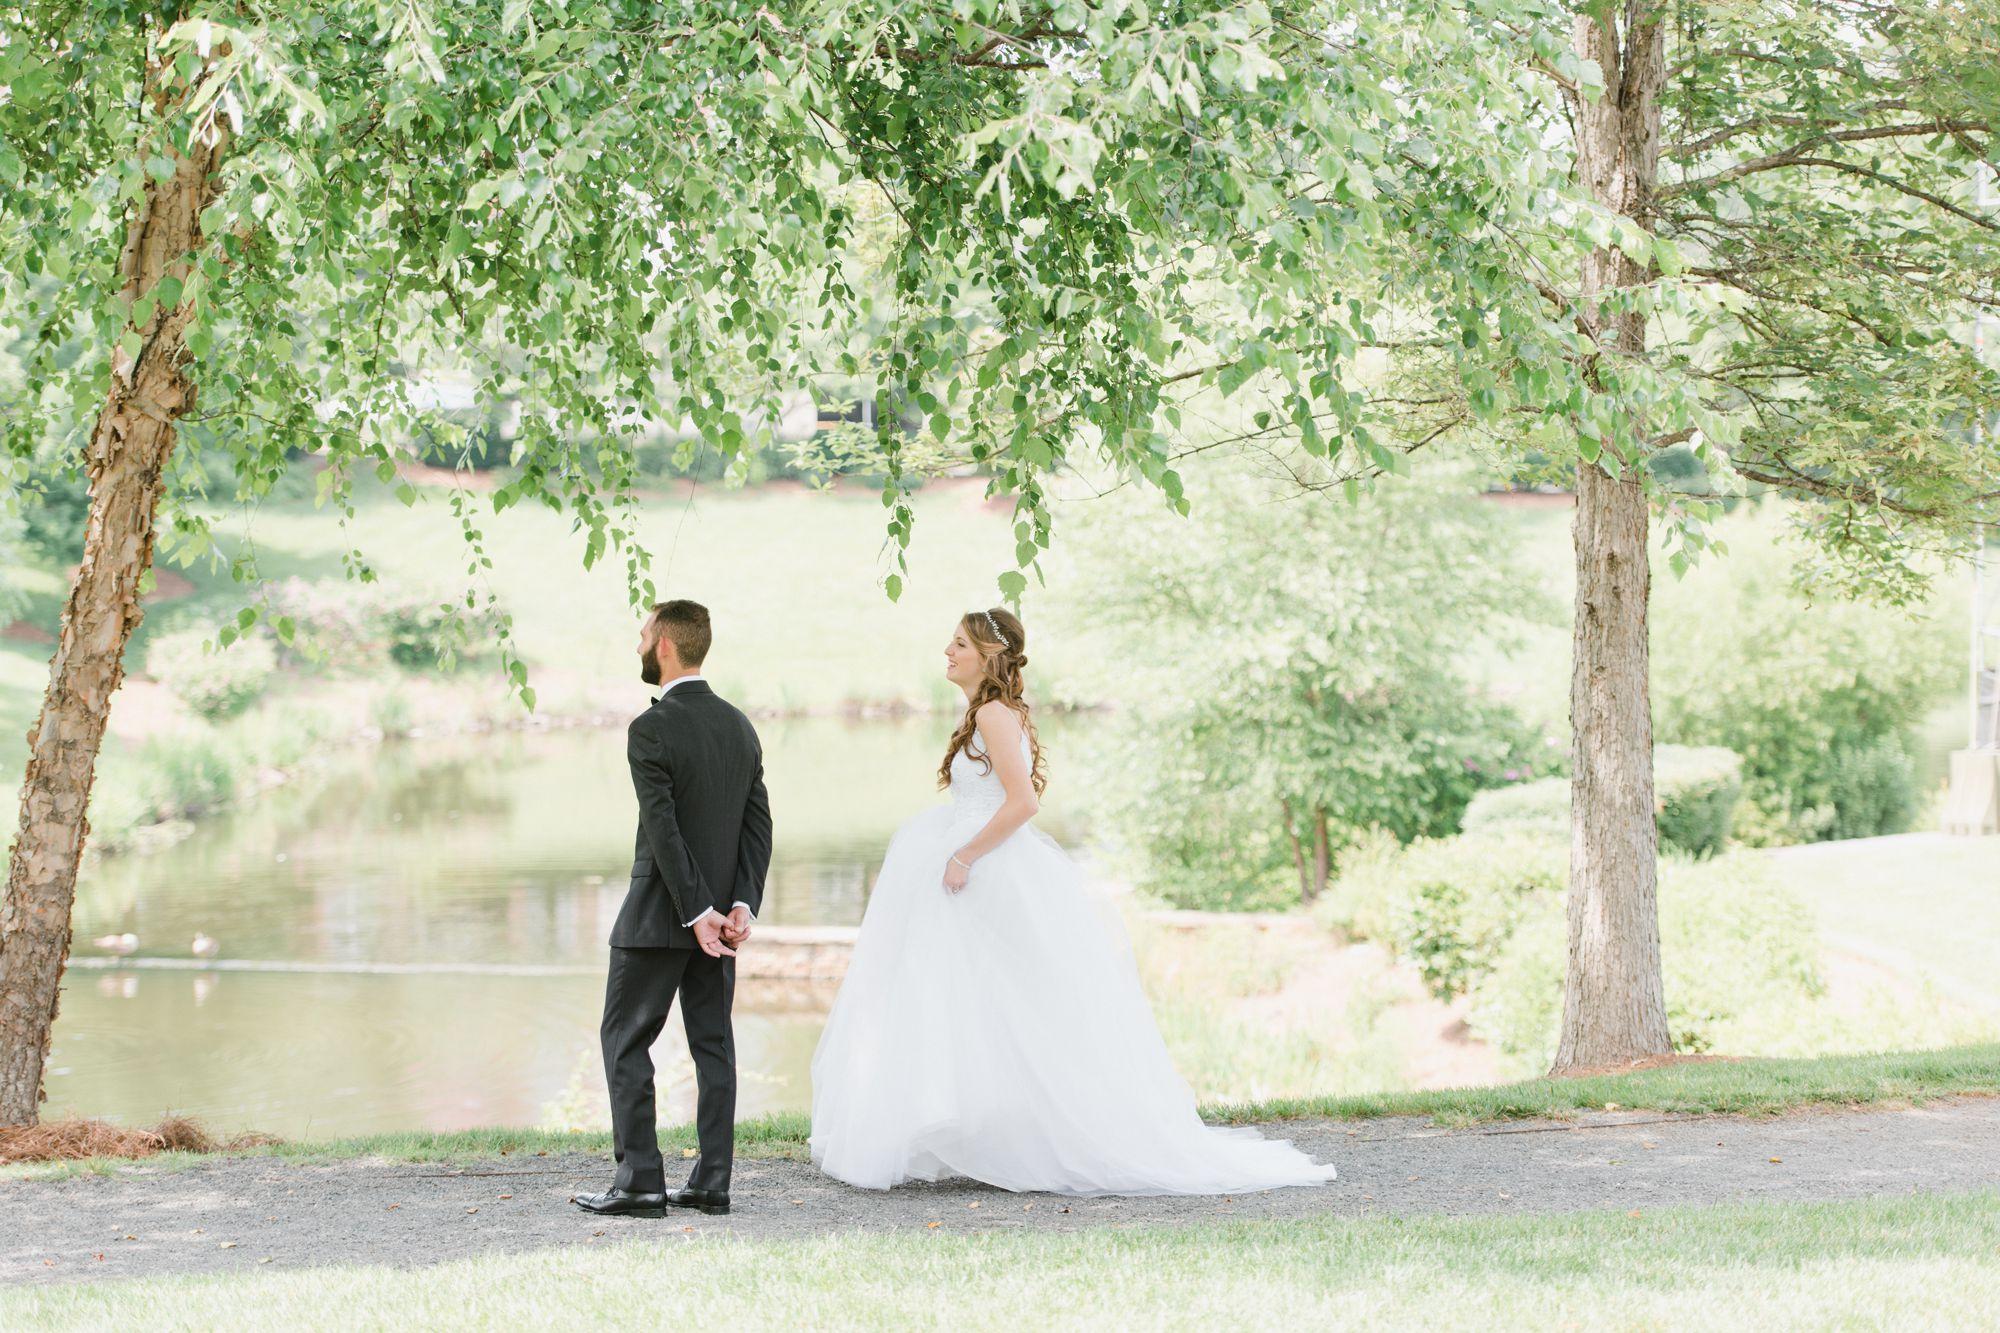 uptown-charlotte-orthodox-greek-wedding 29